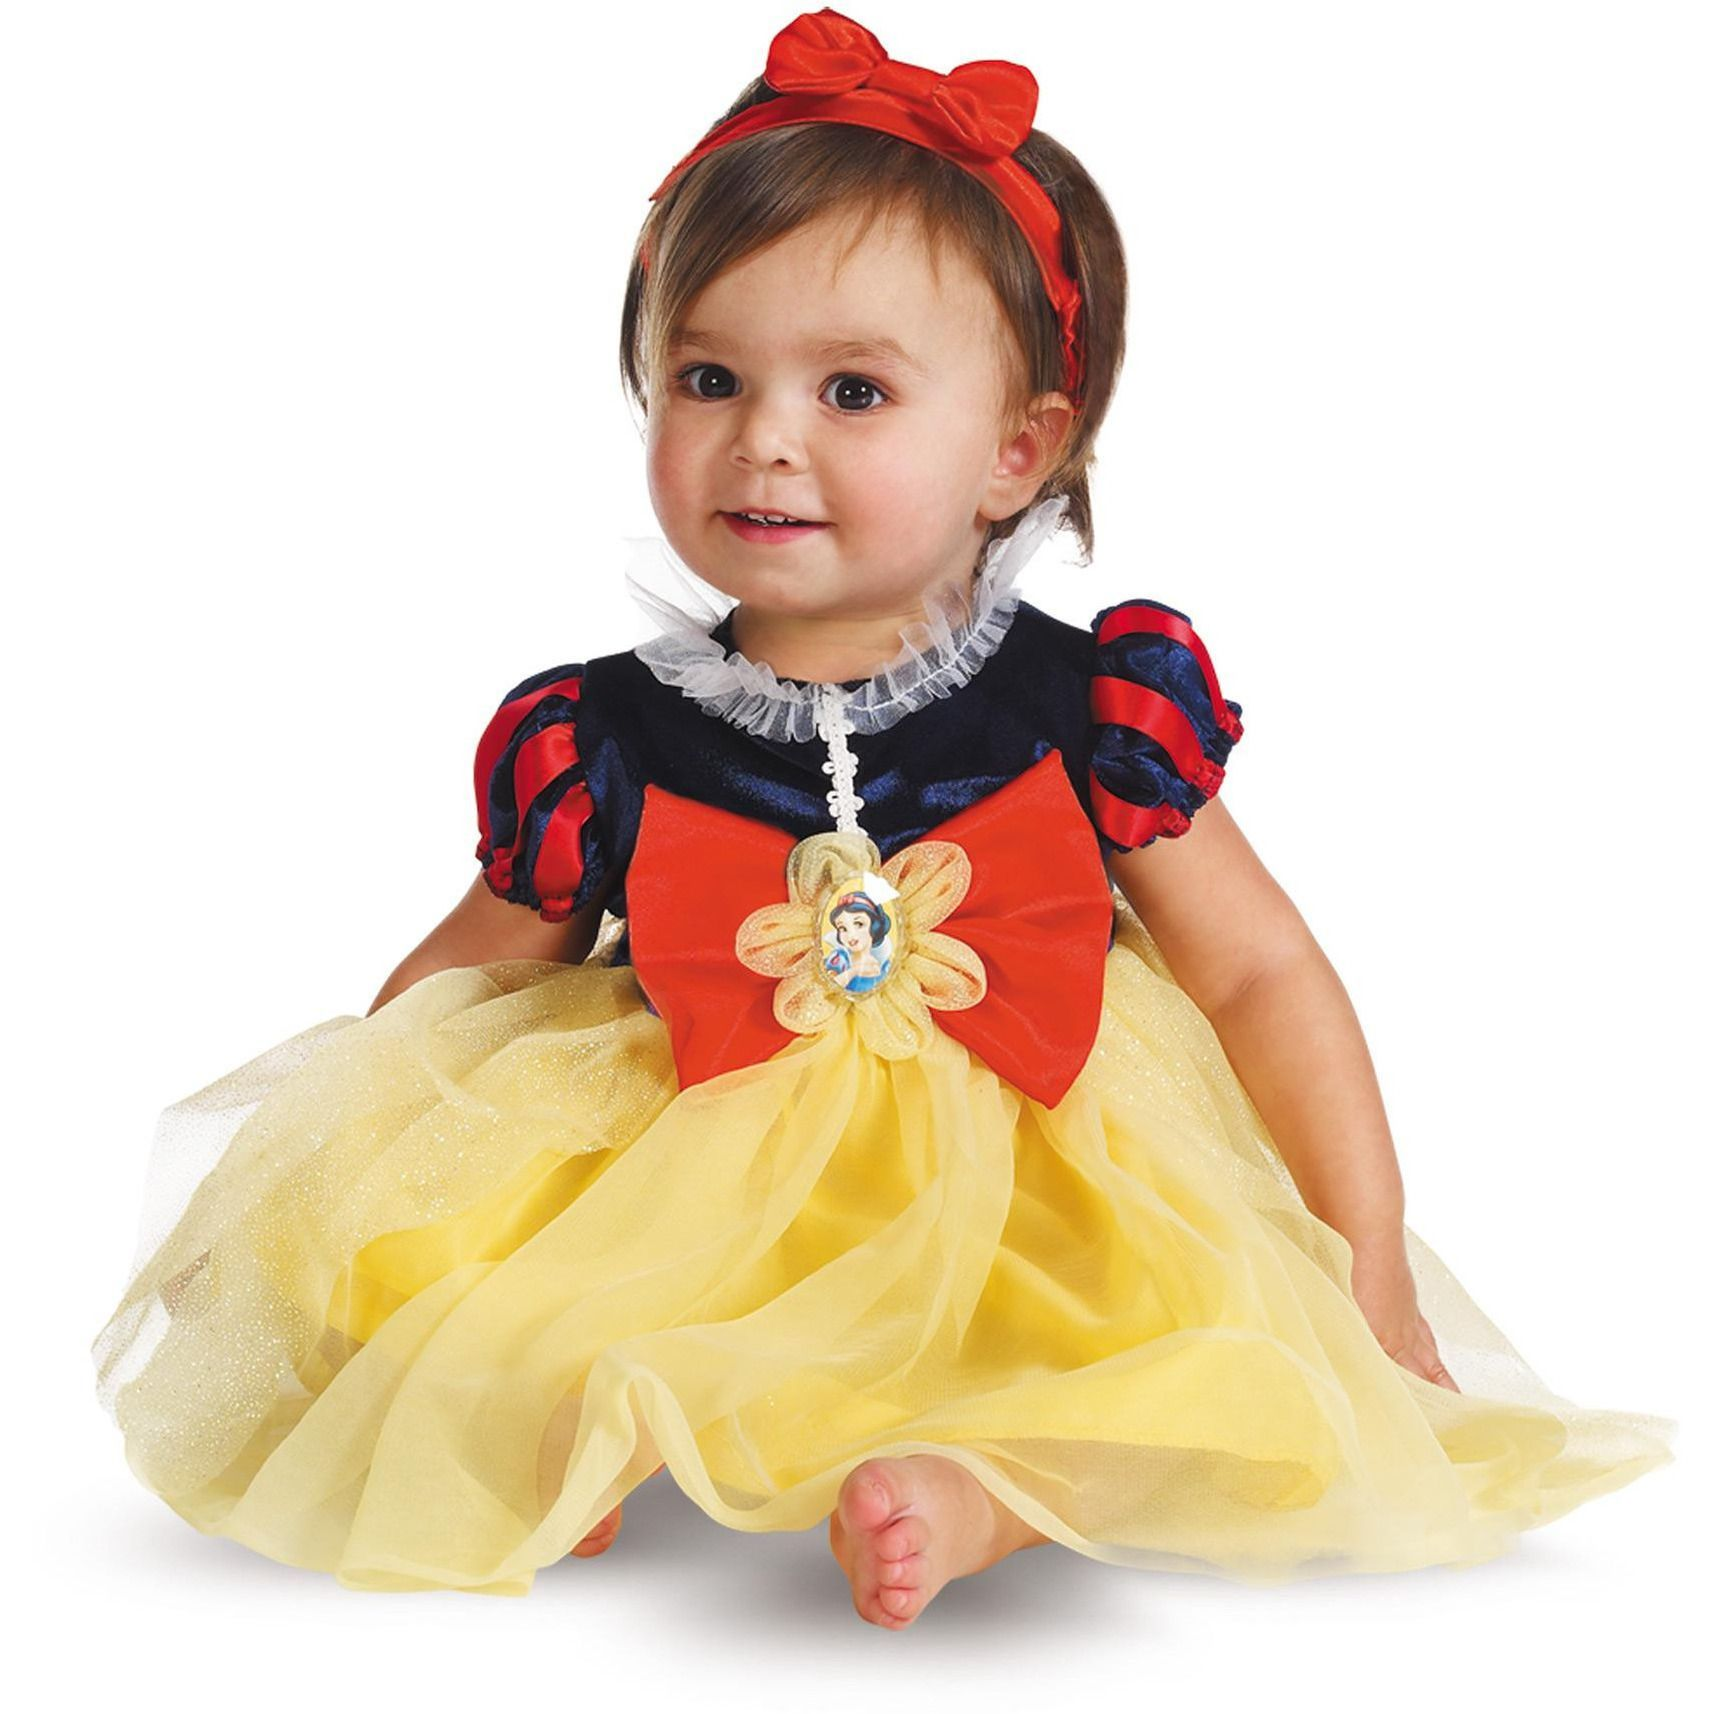 4229b22c0376 Snow White Infant 12-18 Months